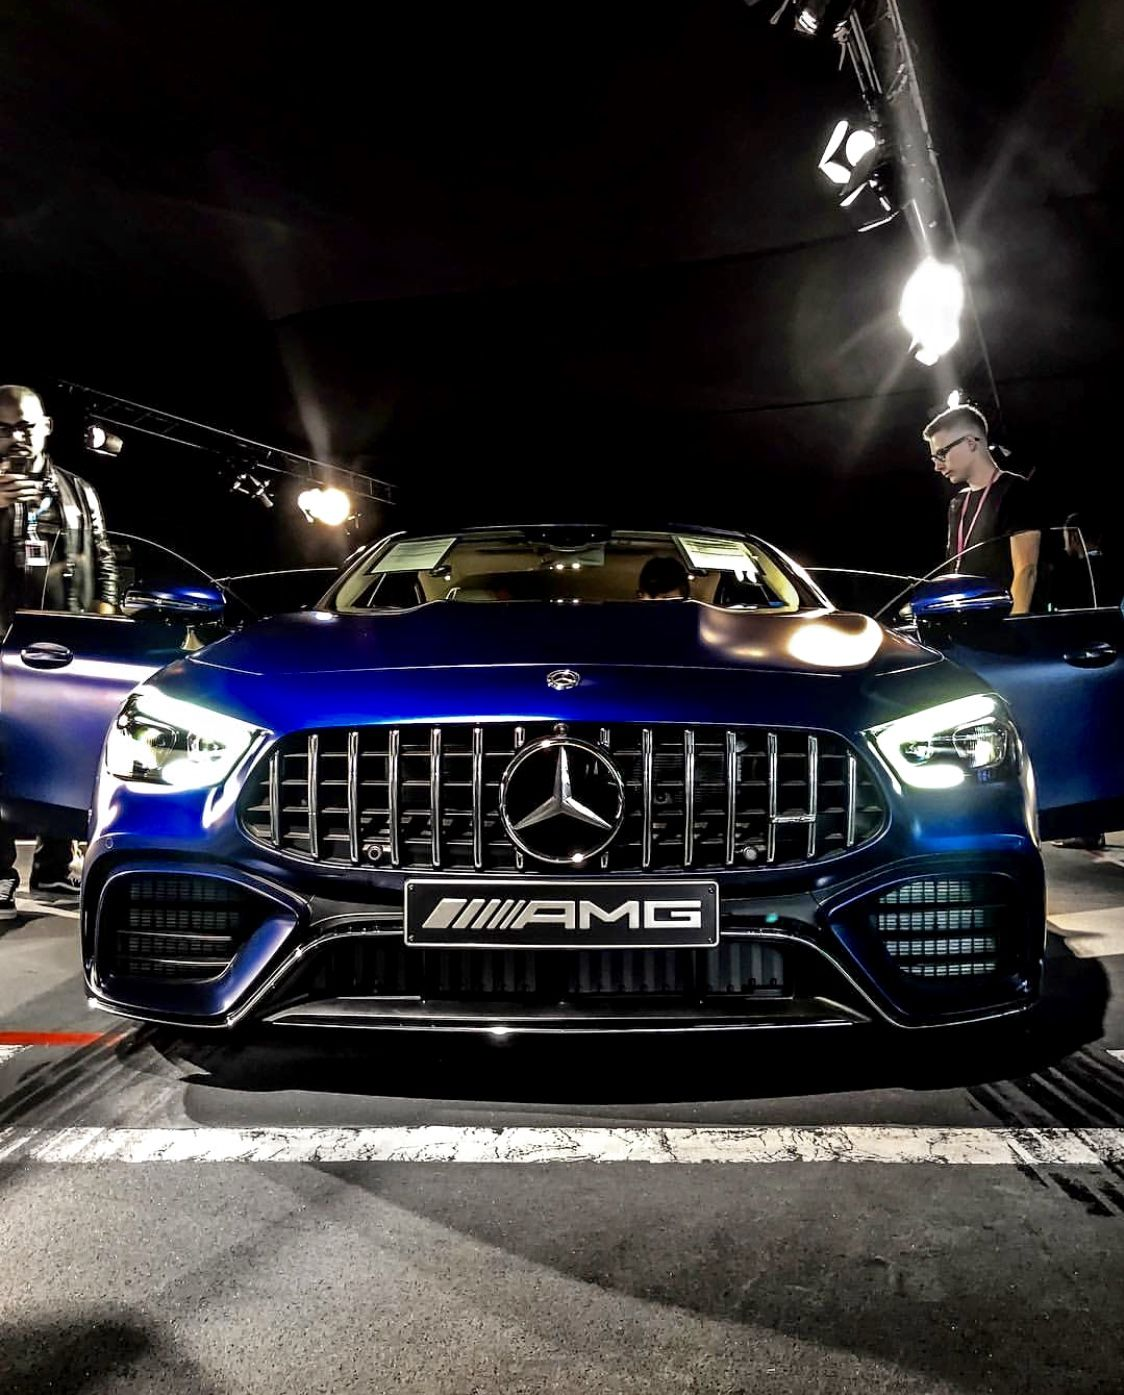 2019 Amg Gt63s Mercedes Benz Amg Benz Mercedes Benz